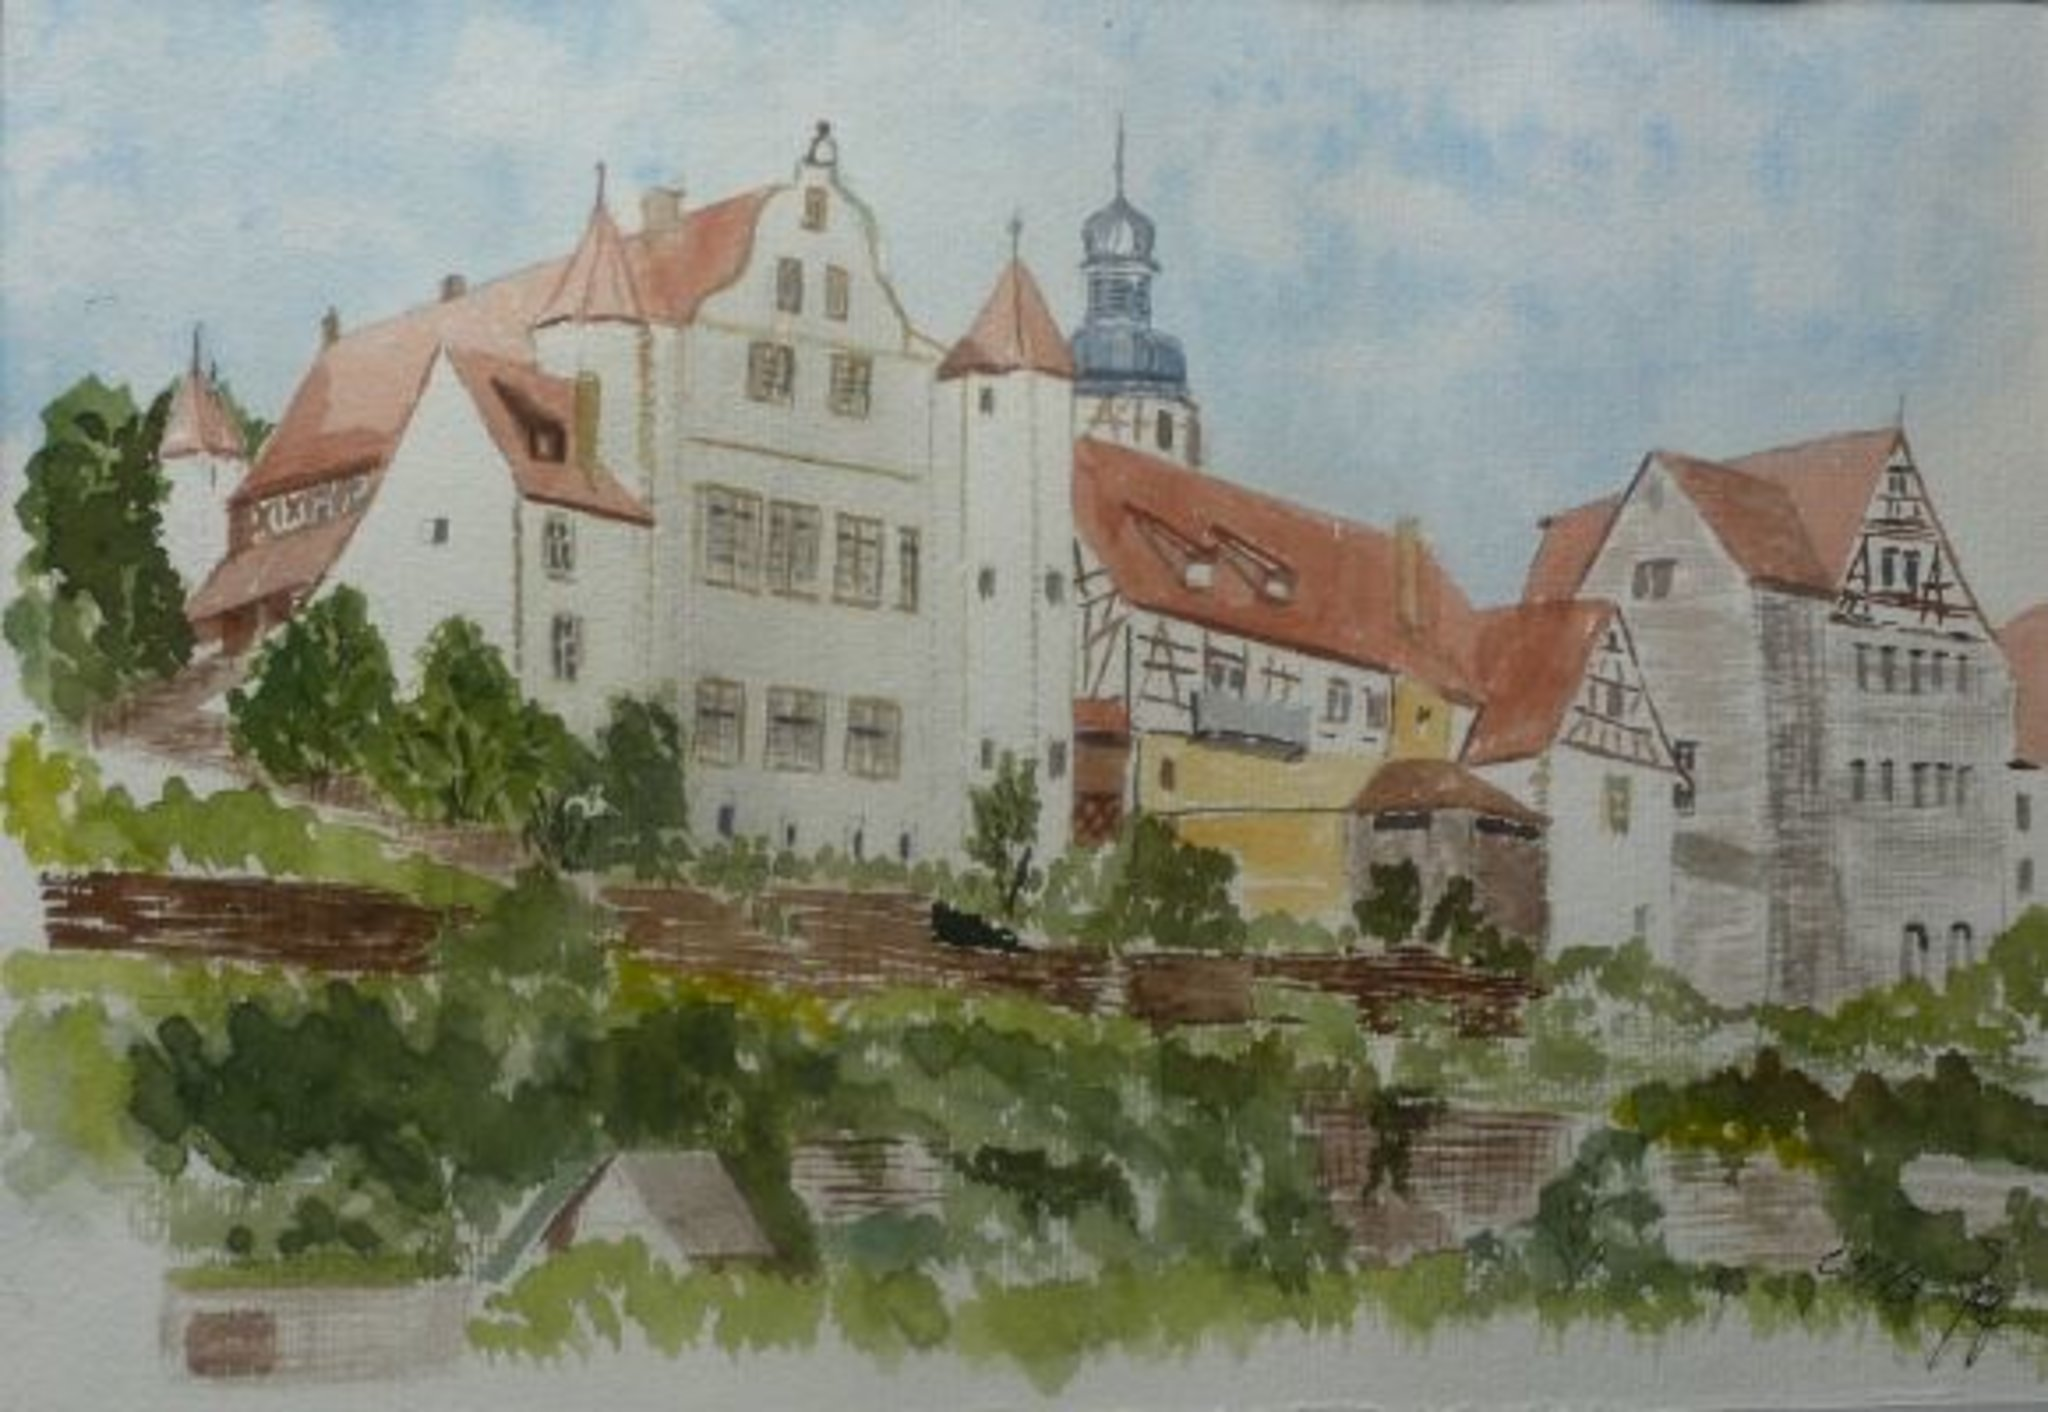 Rathaus Mingolsheim